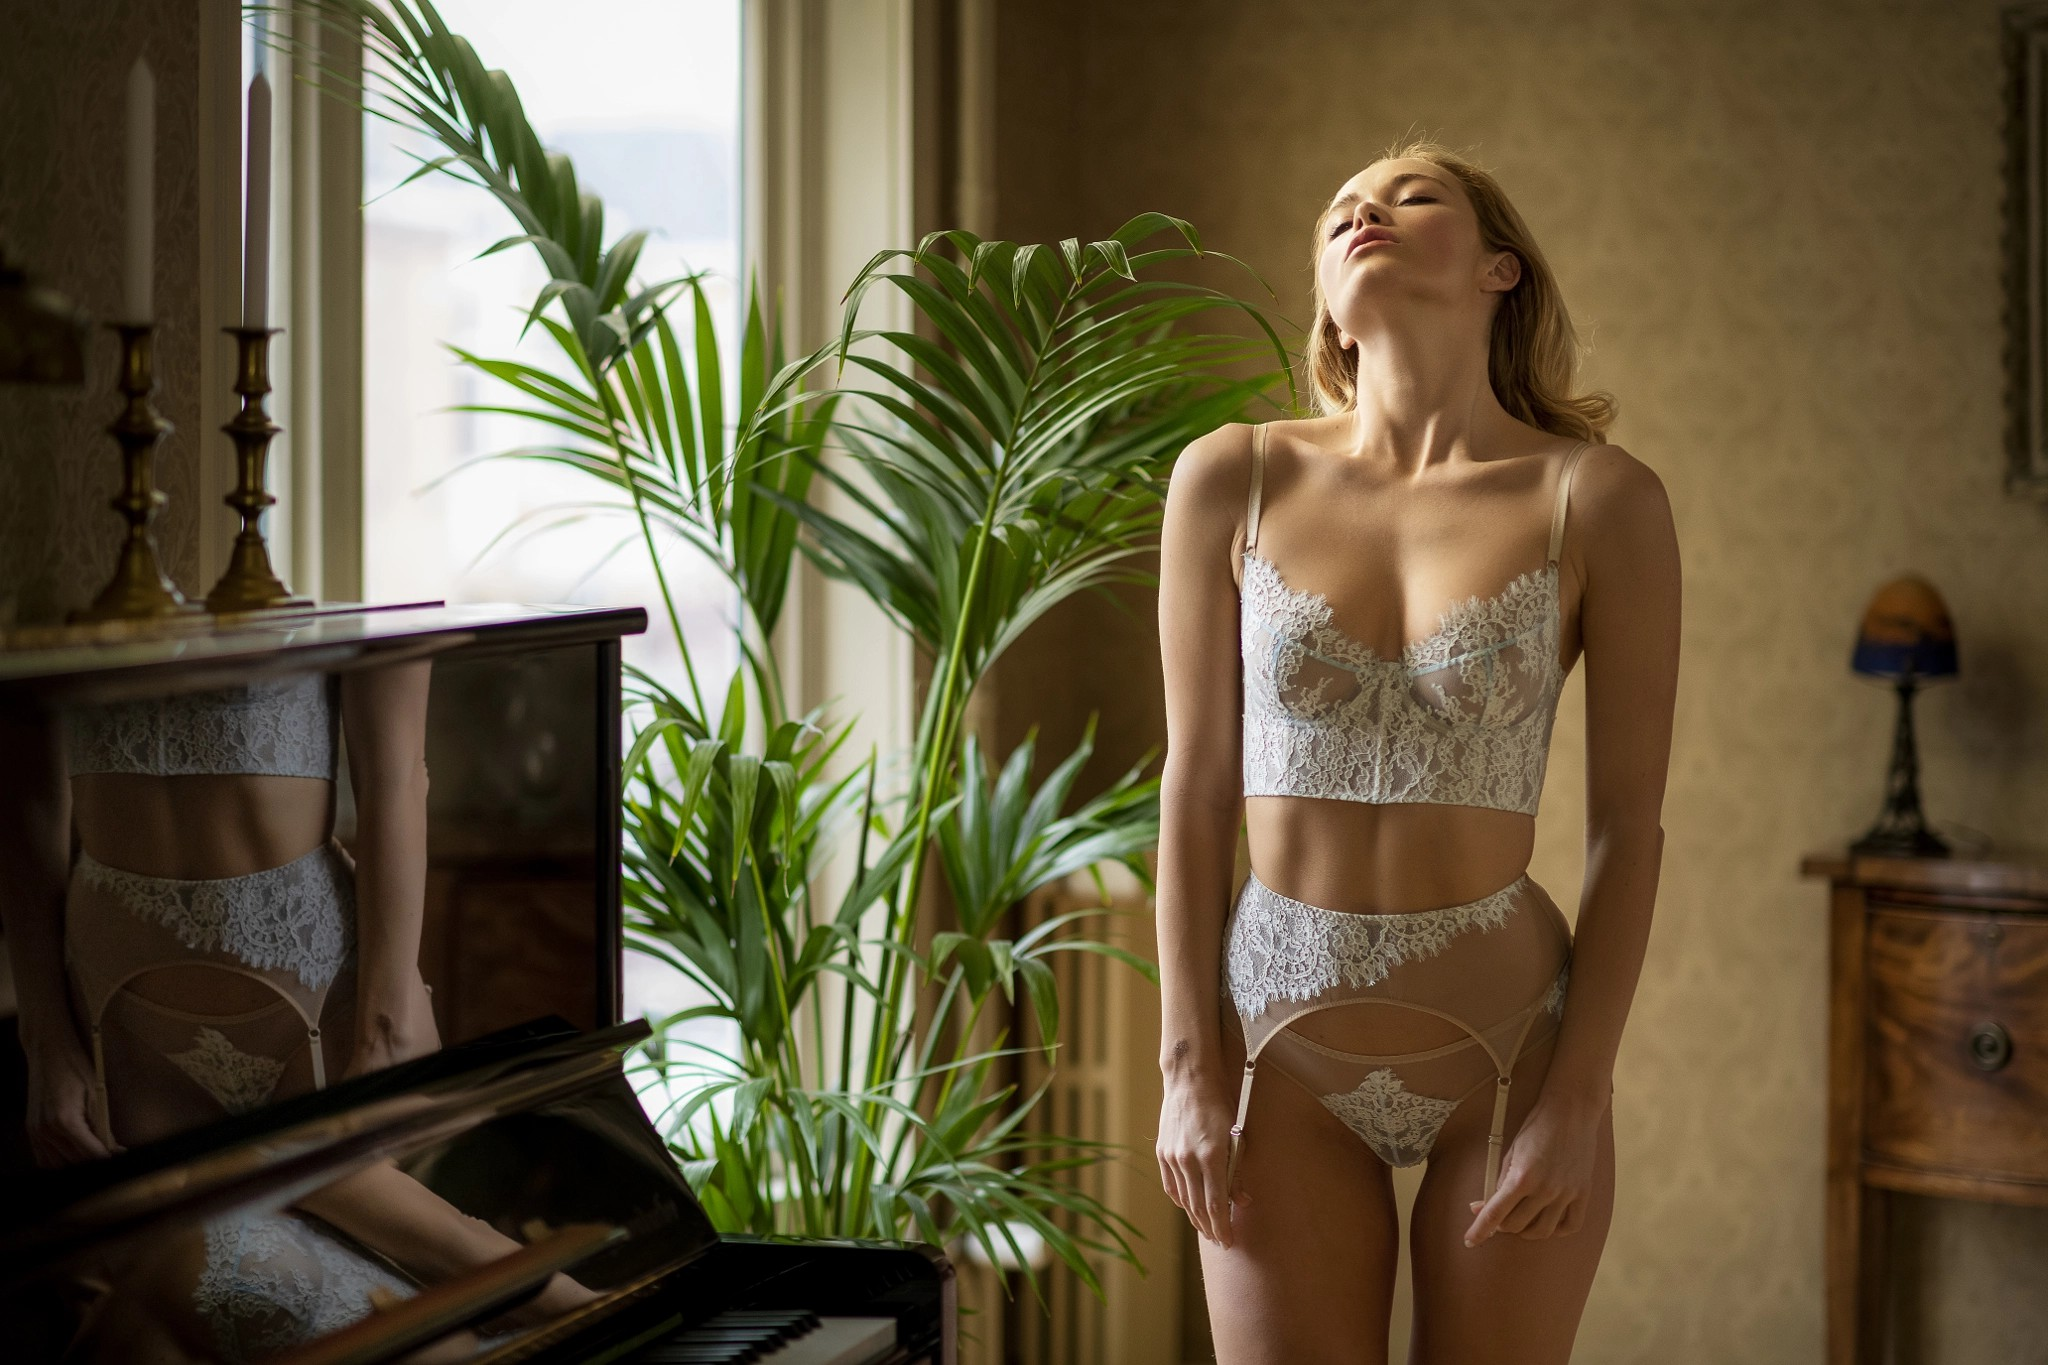 People 2048x1365 Chris Bos white lingerie lingerie women indoors the gap closed eyes women window belly garter belt reflection plants piano Viktoria Yarova